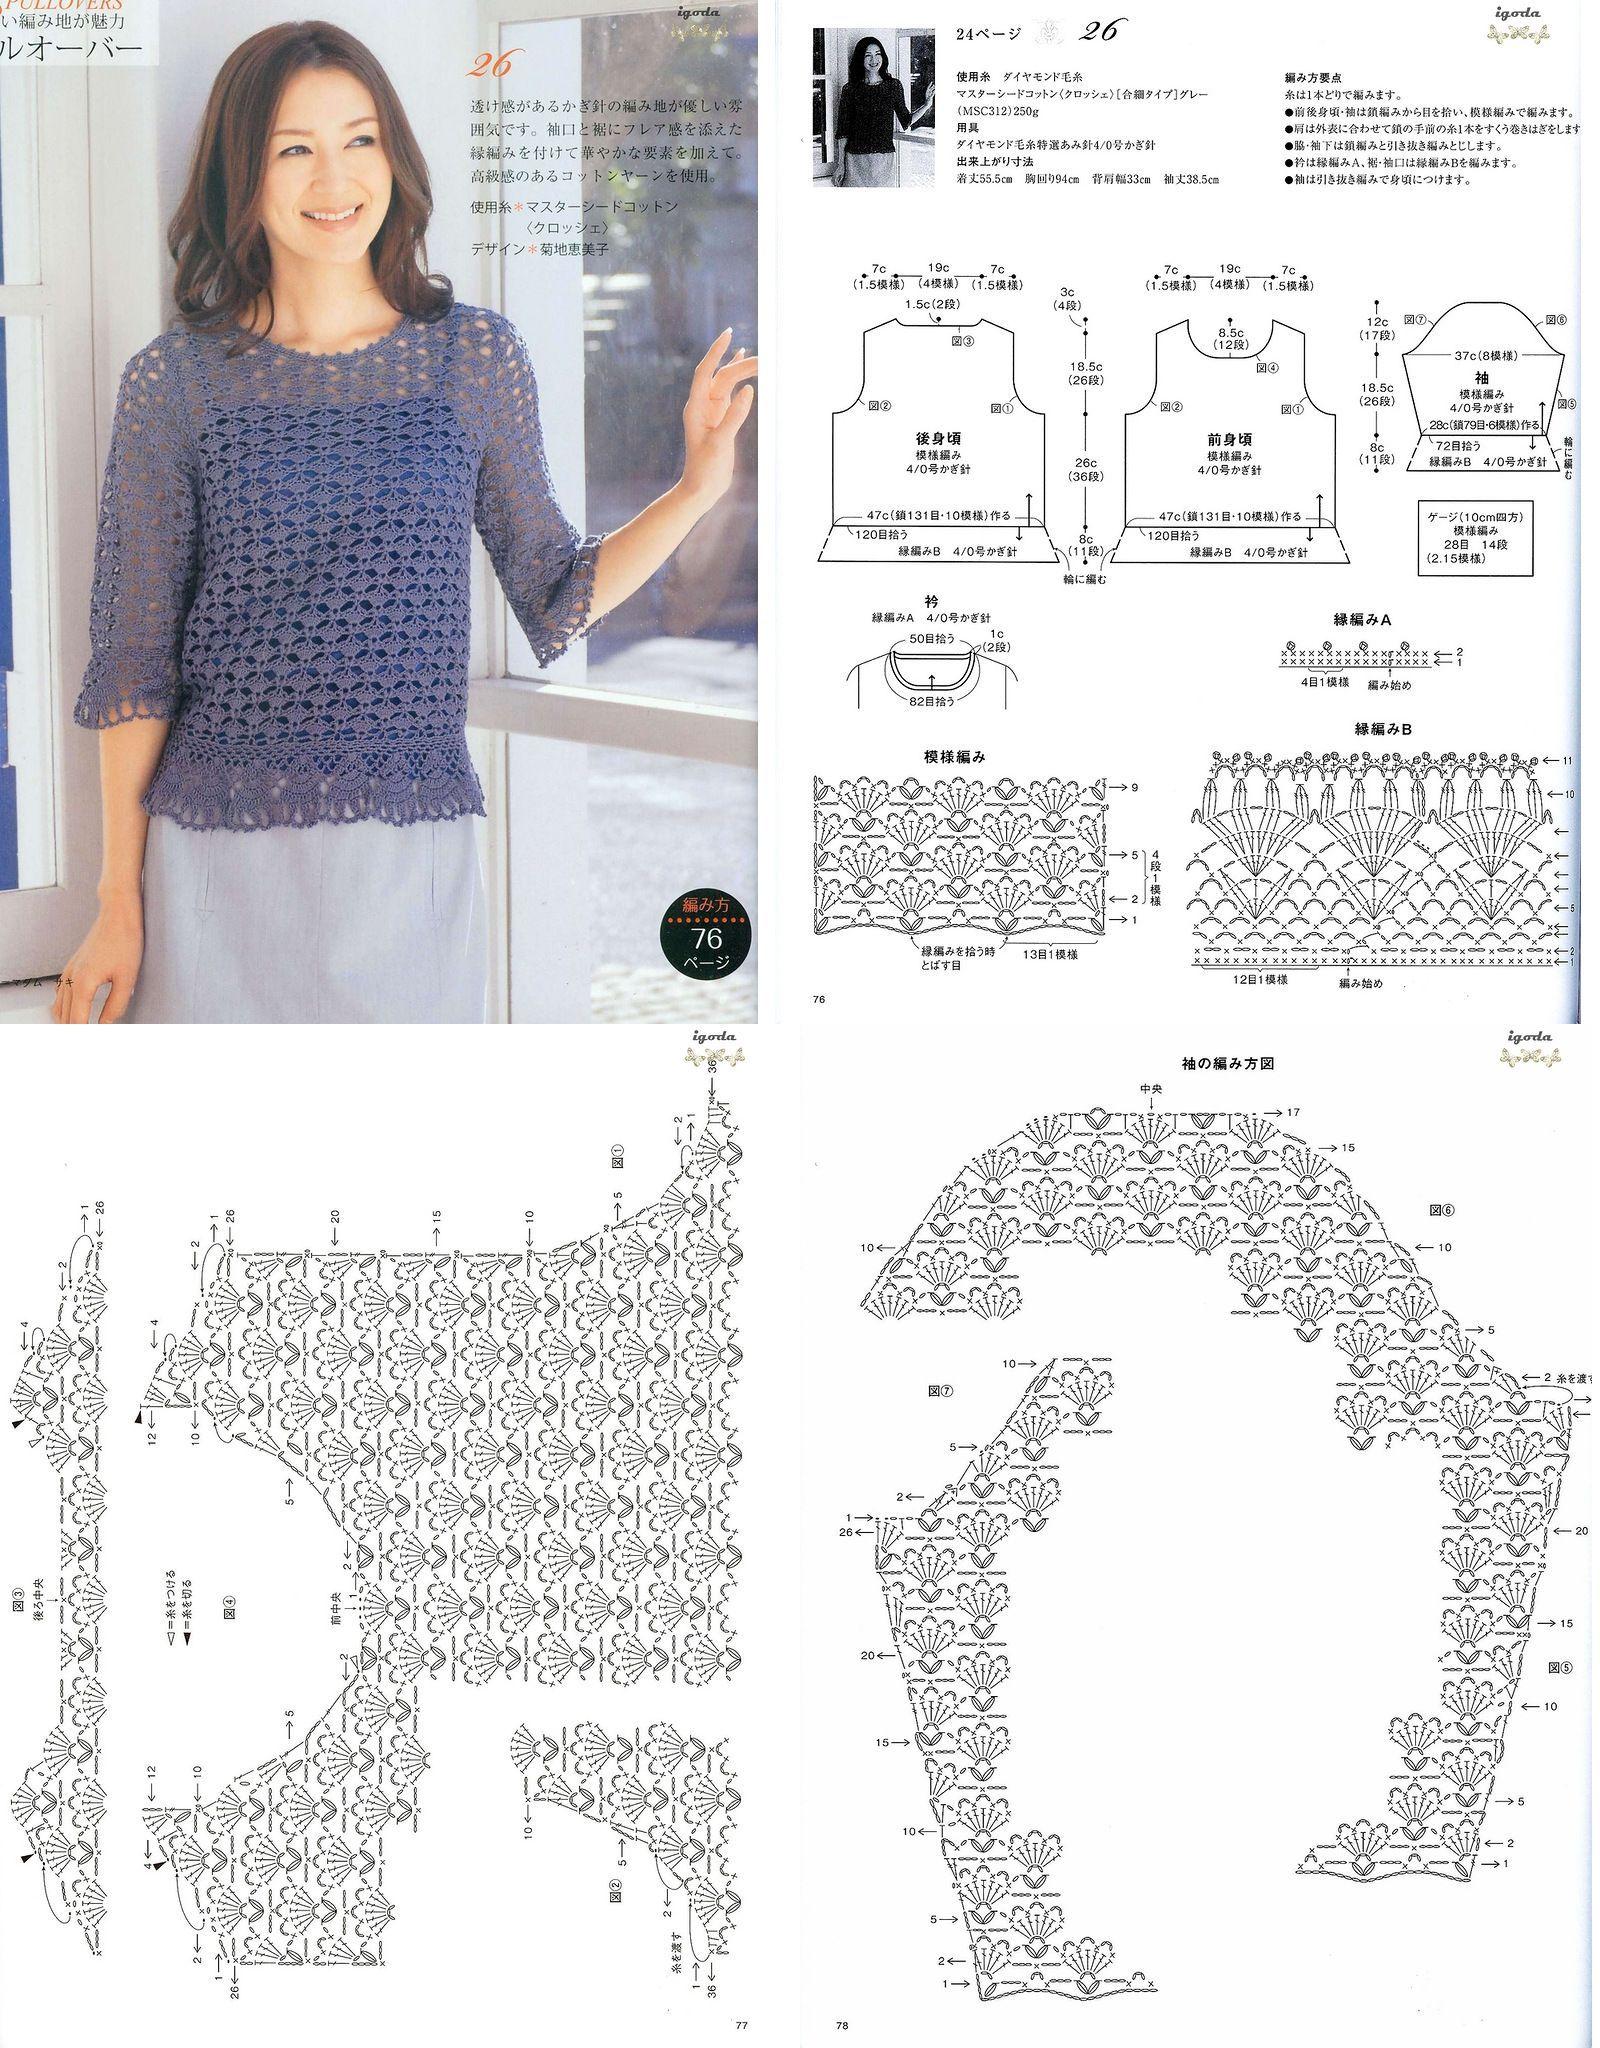 bc1c9ebb3434da0f80373aae2a432ada.jpg 1,600×2,048 pixels | Crochet ...